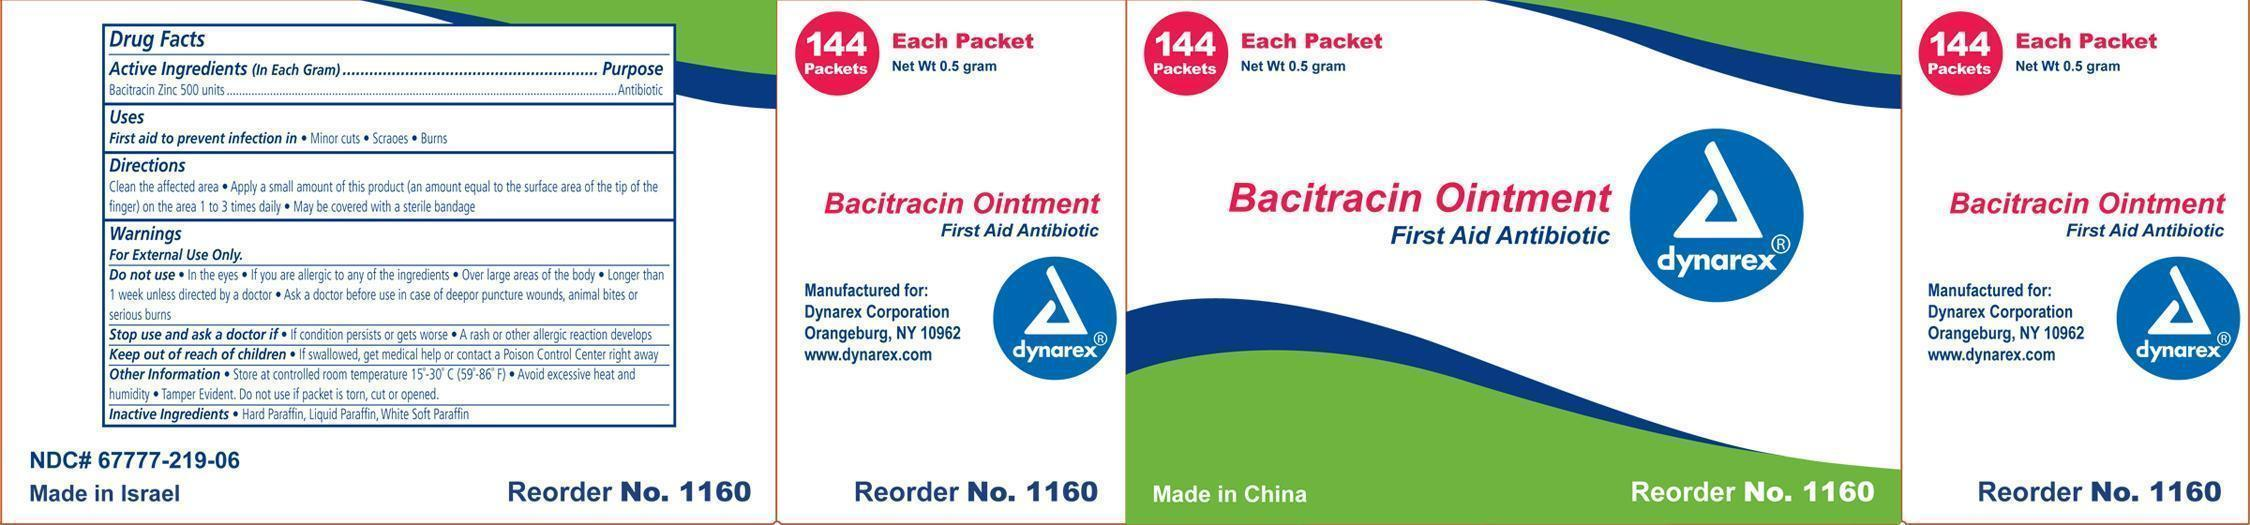 Bacitracin Ointment [Dynarex Corporation]